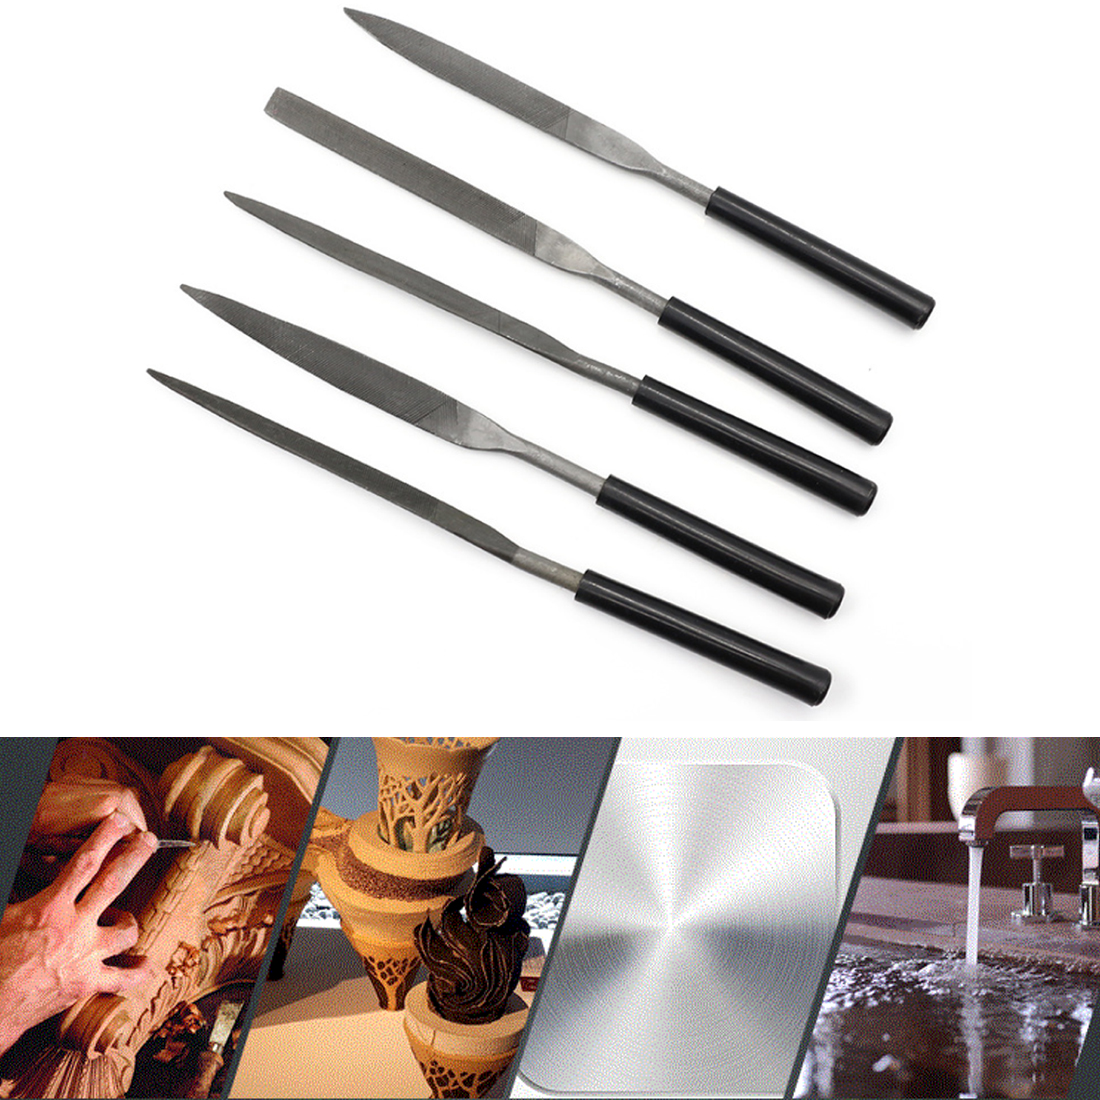 5pcs 140mm Needle Files Set Jeweler Diamond Carving Craft Tool Metal Glass Stone Black цены